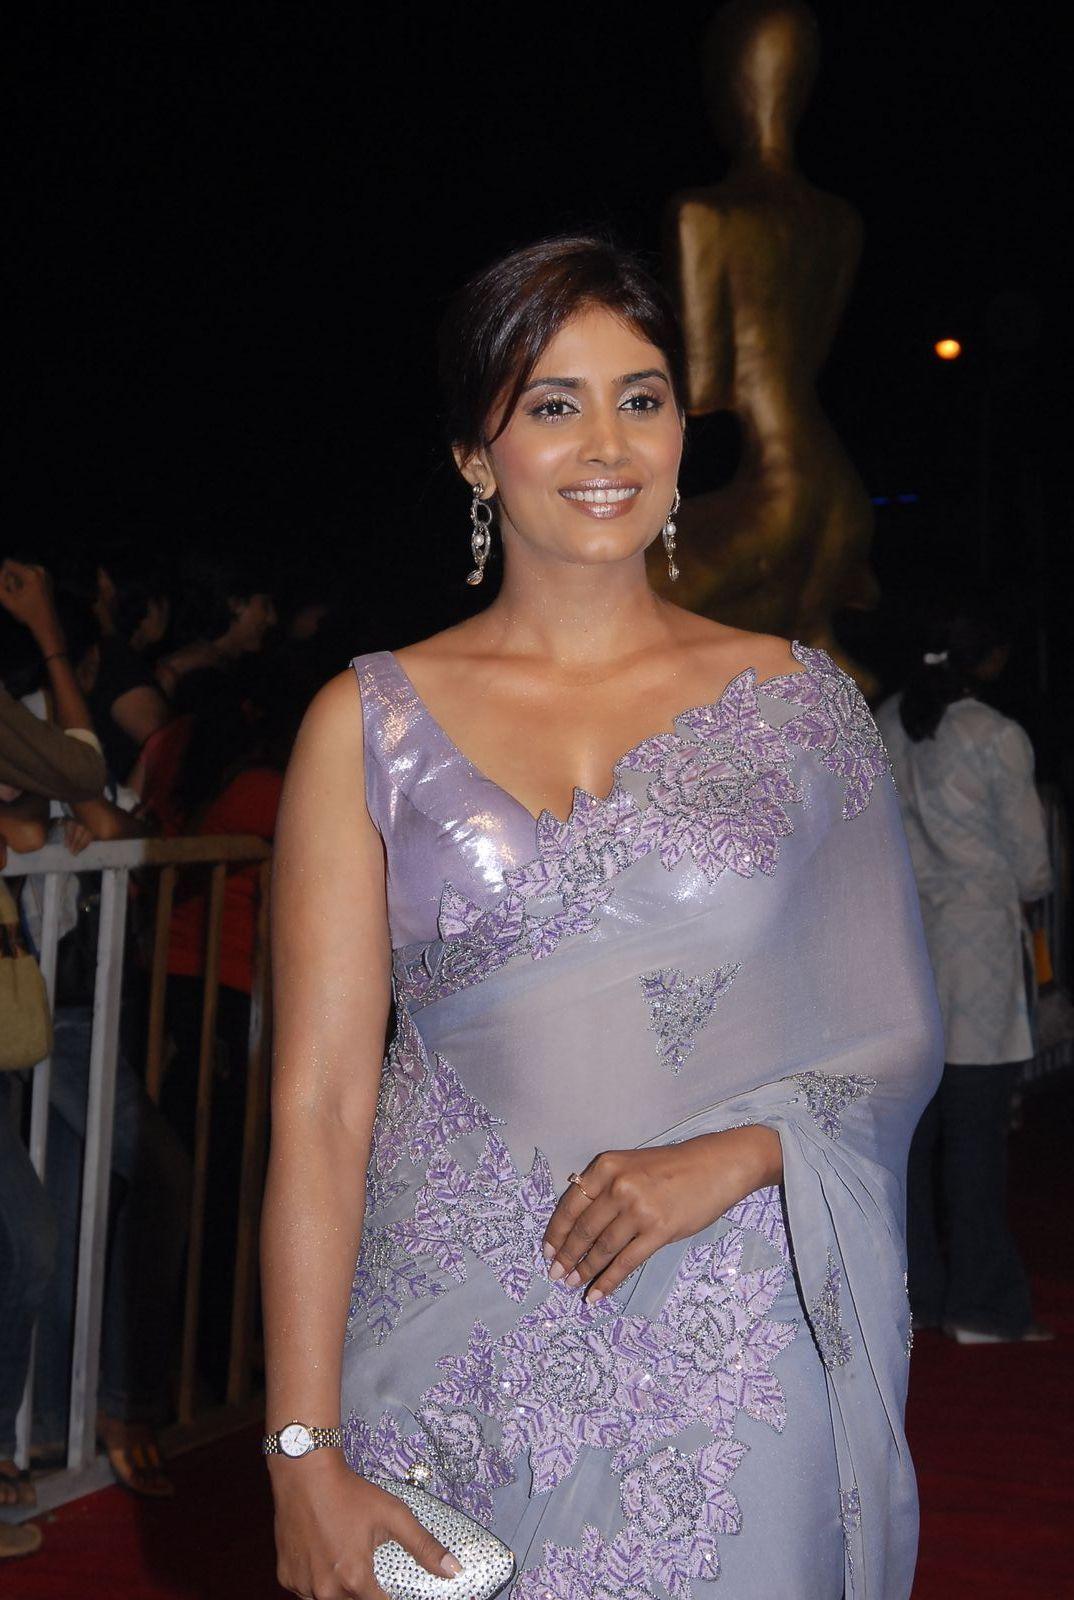 Shanvi Cute Hd Wallpapers Sonali Kulkarni Look Gorgeous In Saree Hd Group Sex